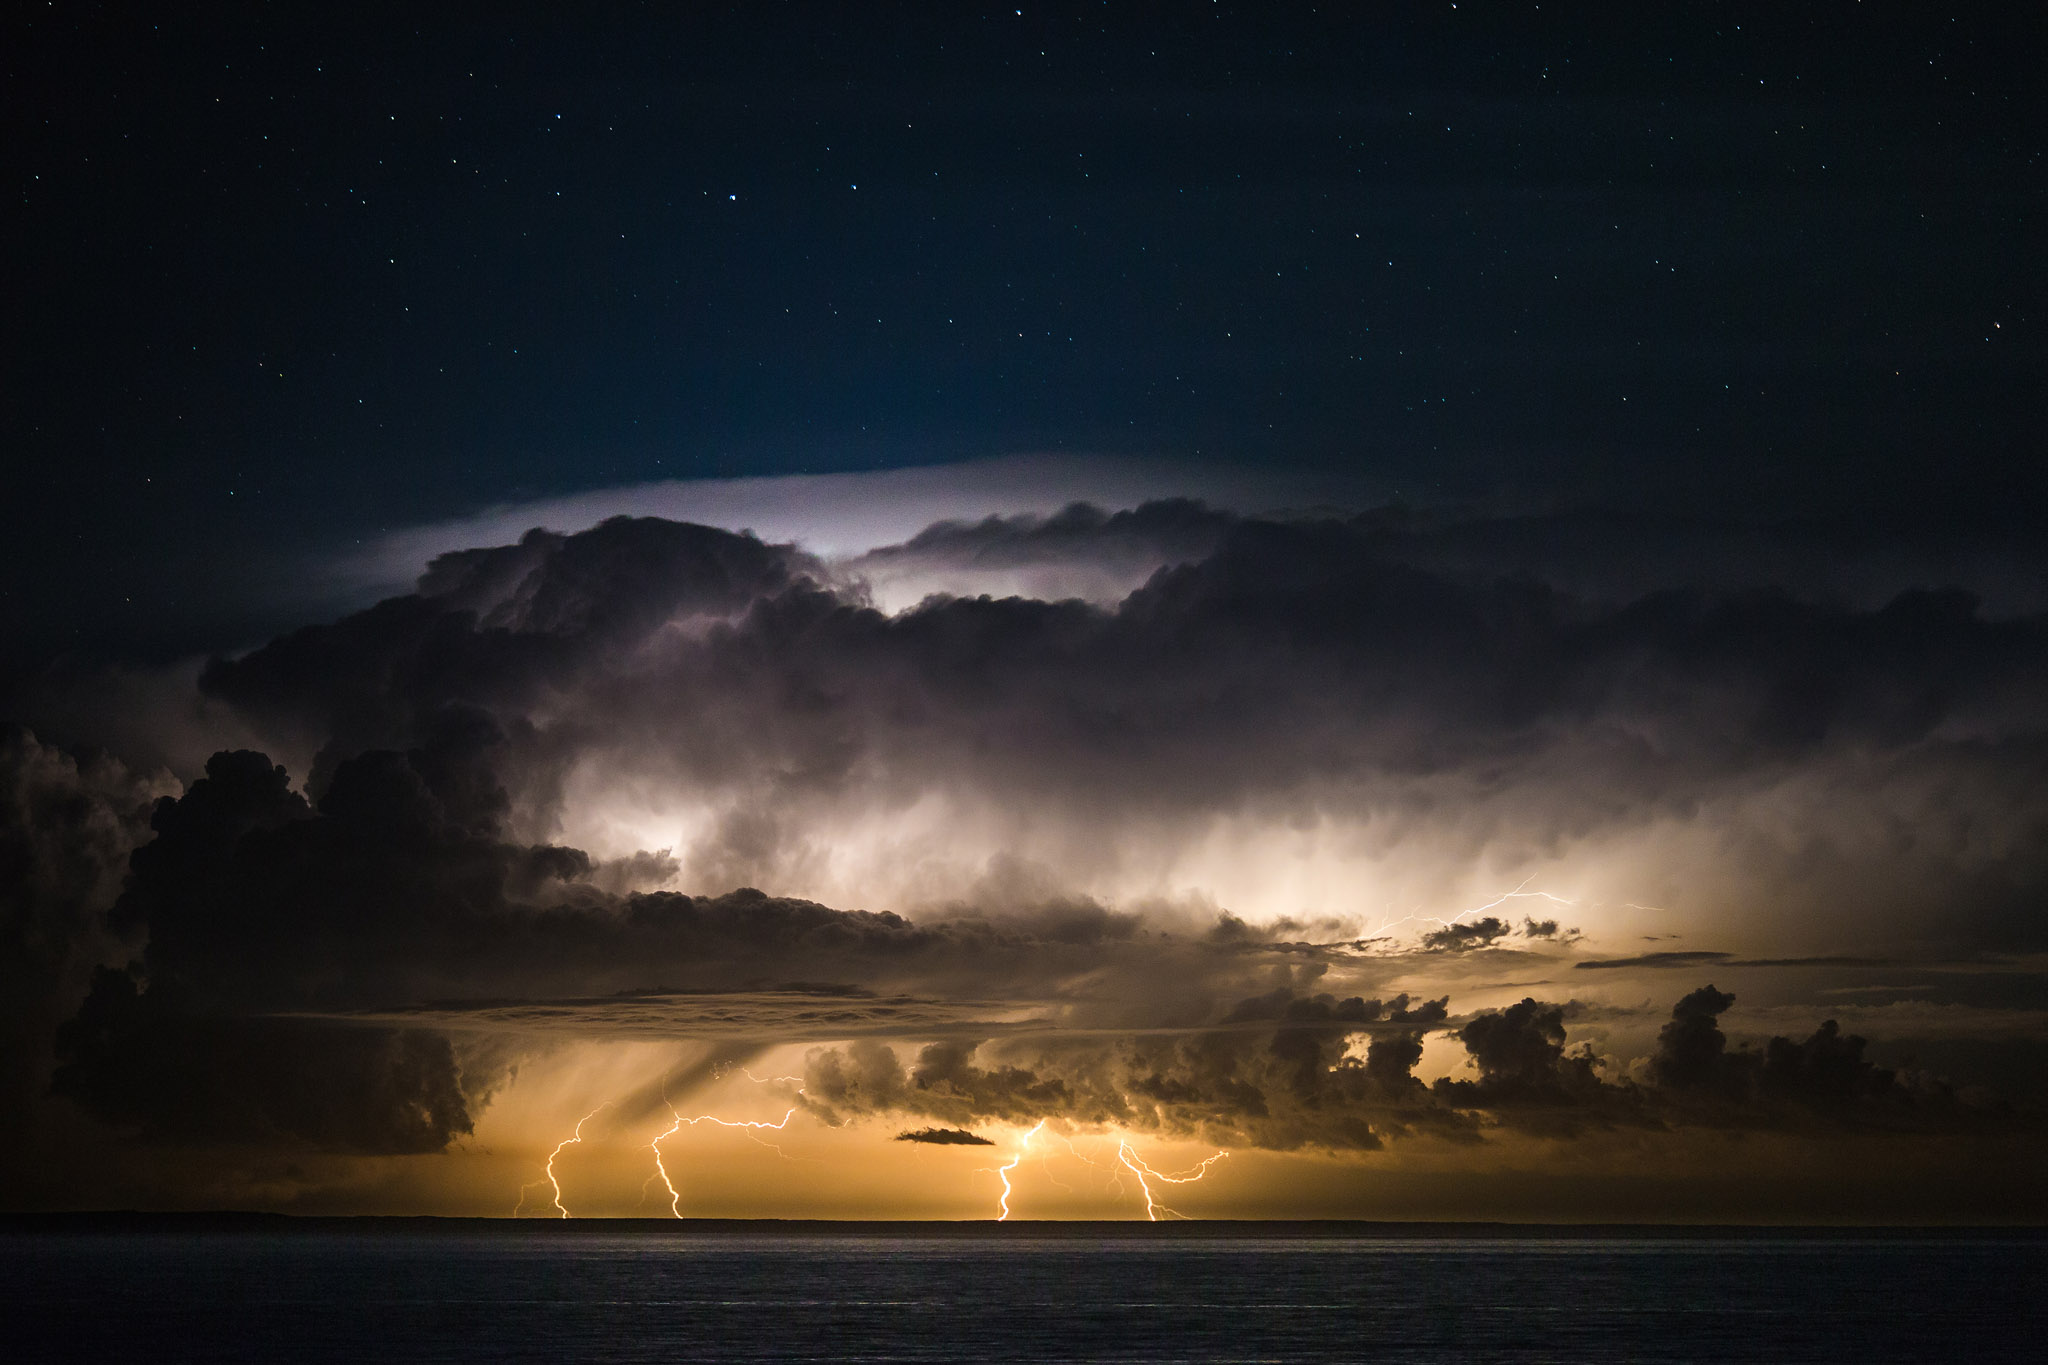 wedding-travellers-argentina-peninsula-valdes-storm-lightning